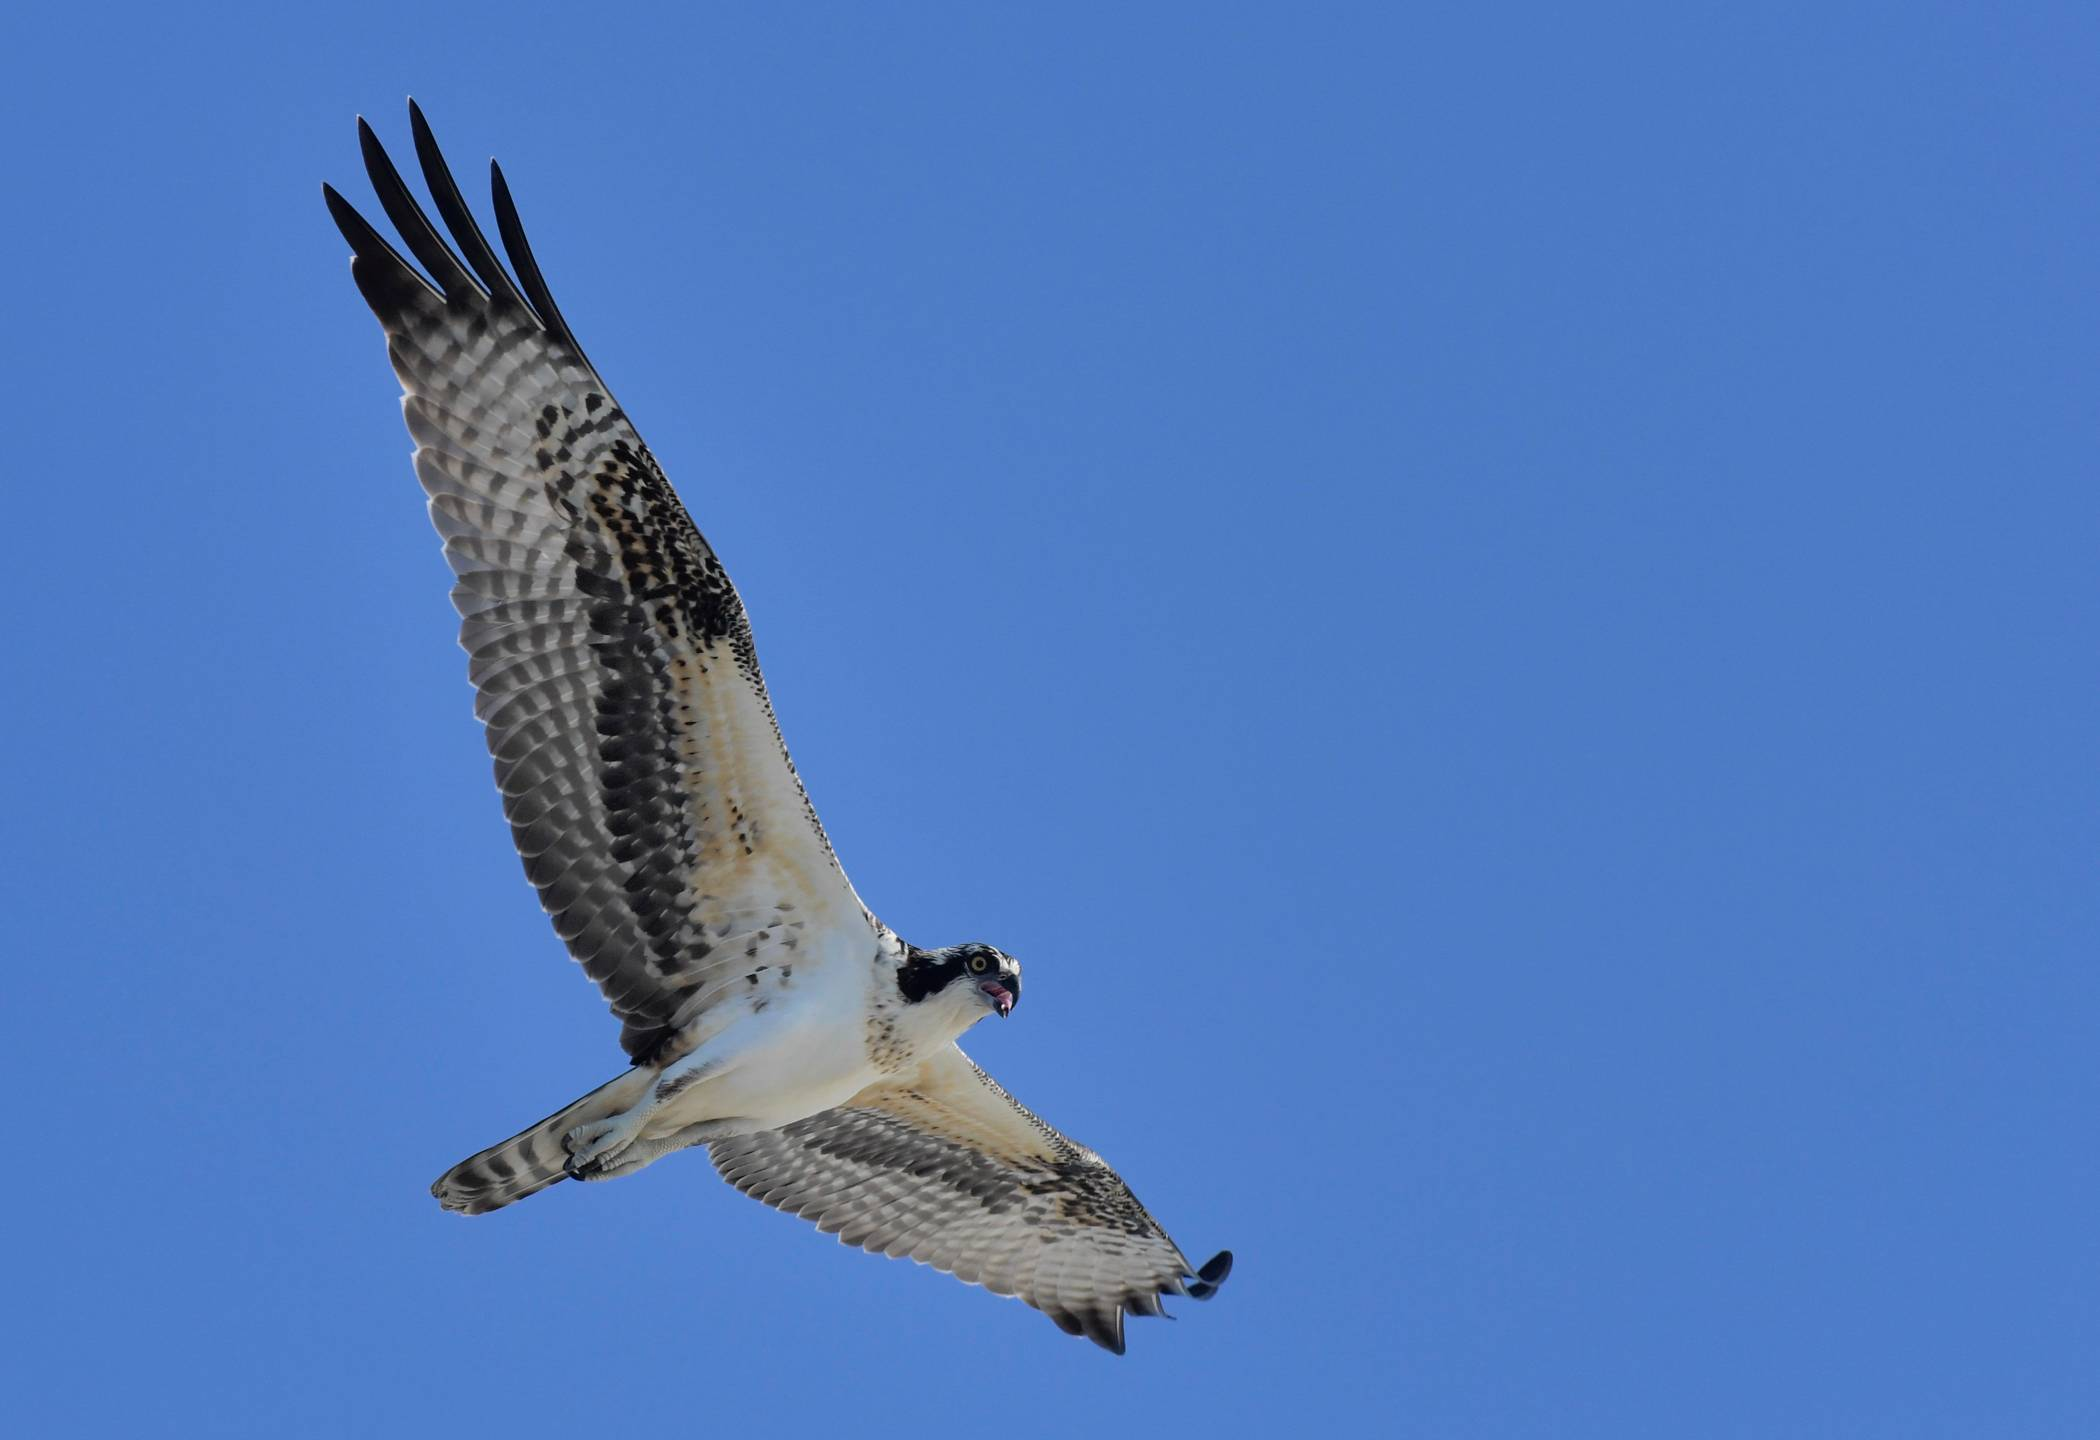 Balbuzard pêcheur - Osprey  Août '16 - August 16